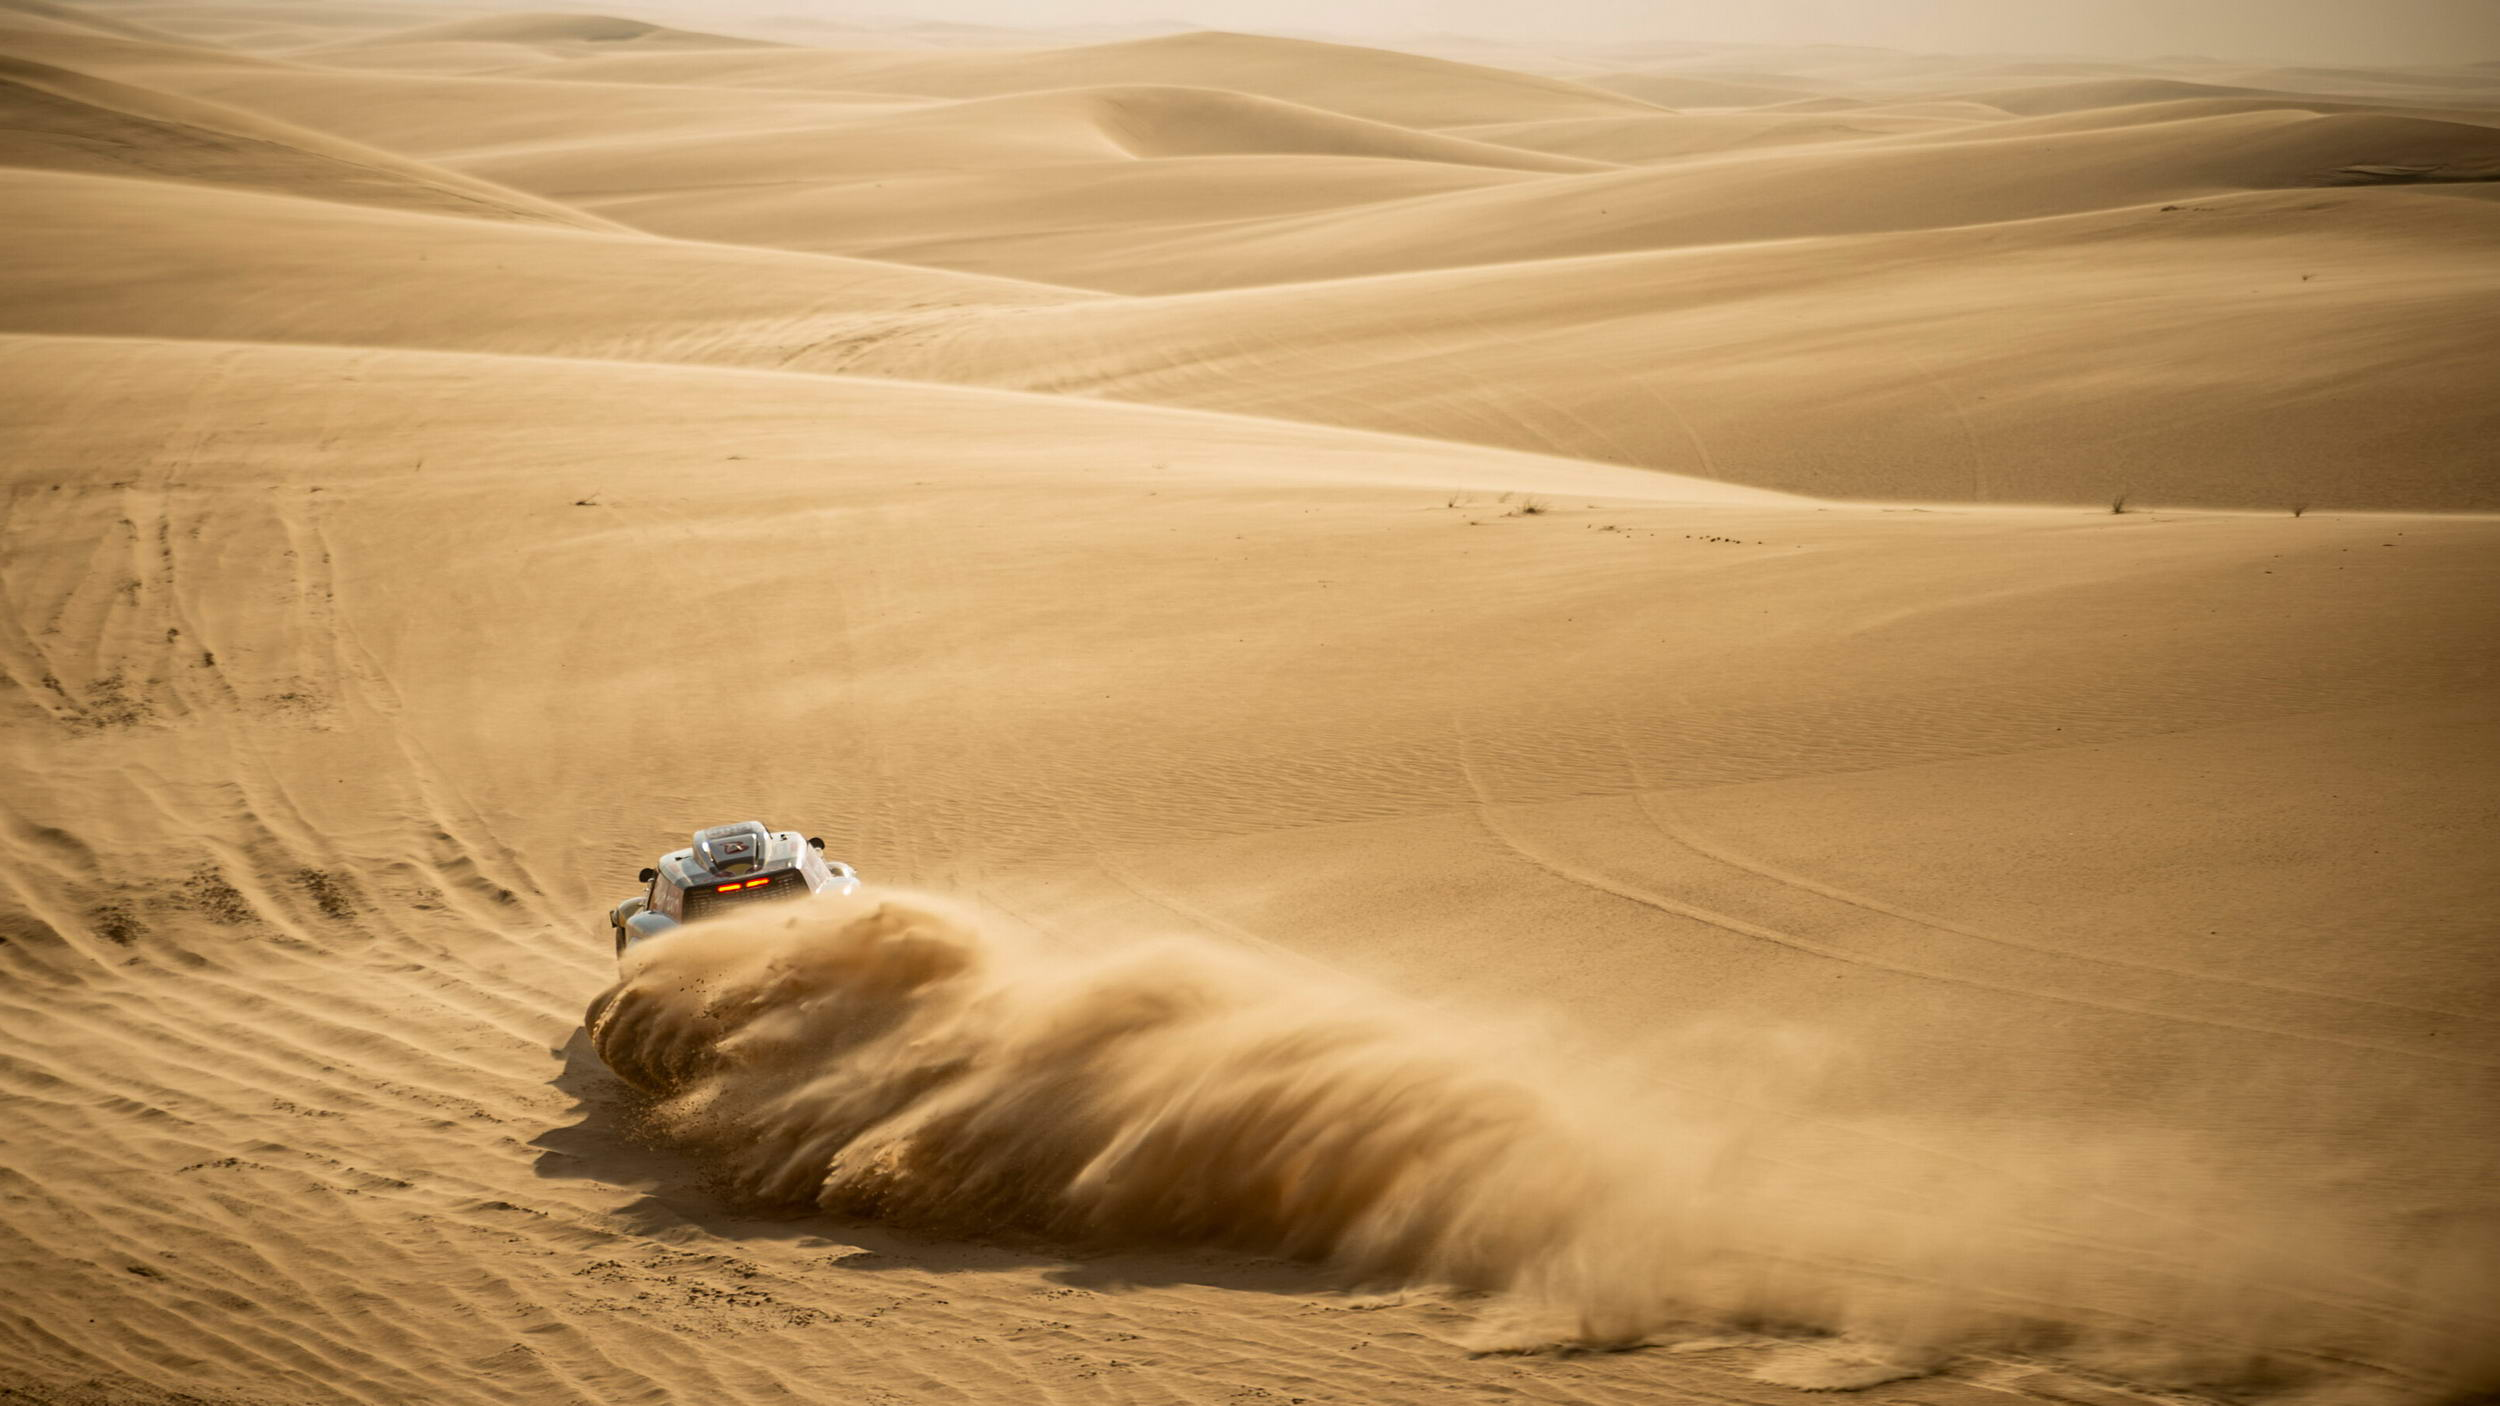 Dakar 2021 – Προεπισκόπηση: Η περιπέτεια ξεκινά (+ βίντεο)